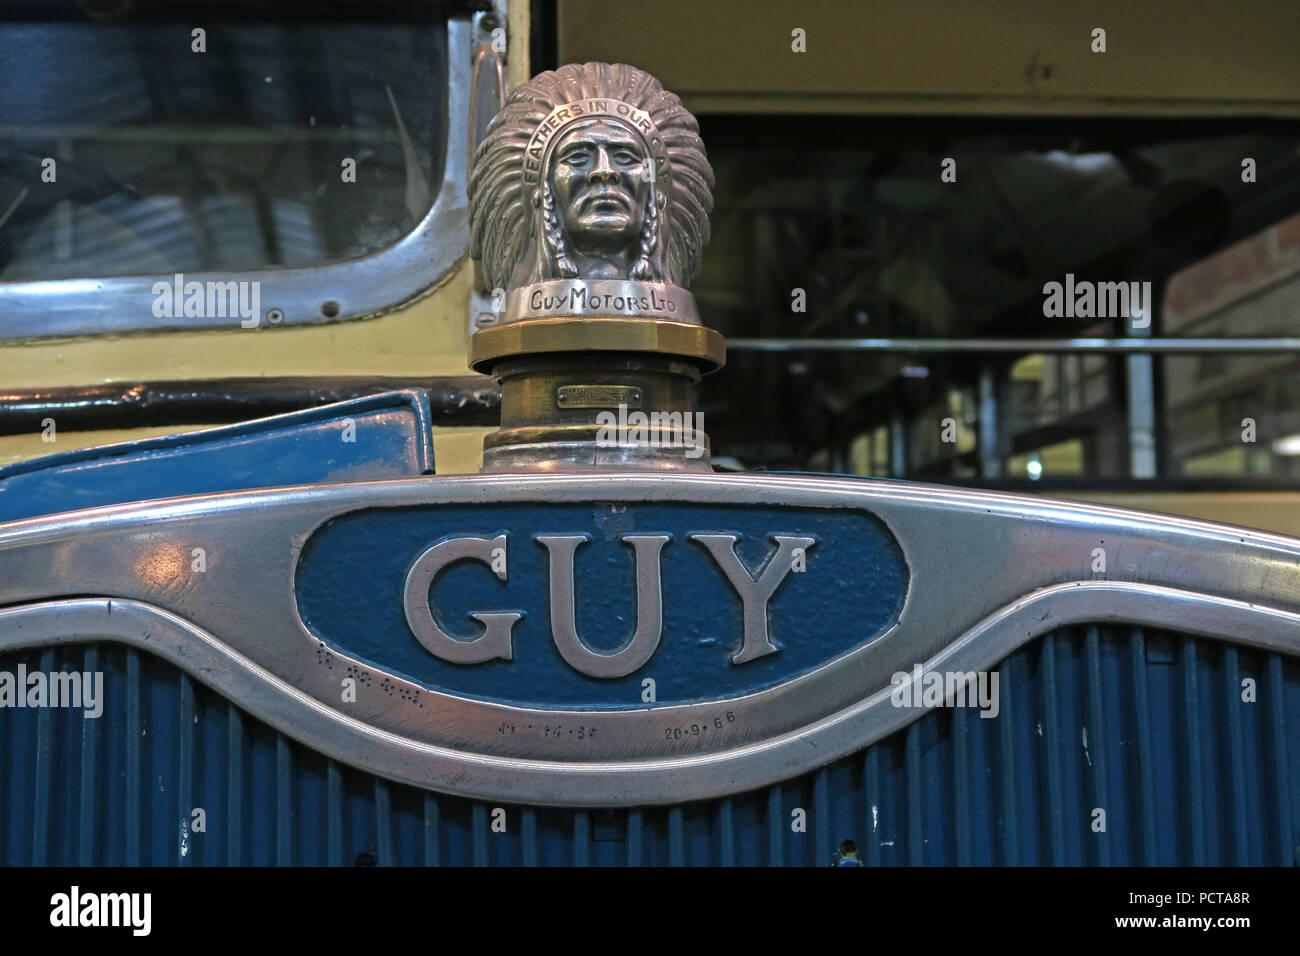 GoTonySmith,@HotpixUK,feathers,logo,radiator,transport,Britain,British,Great